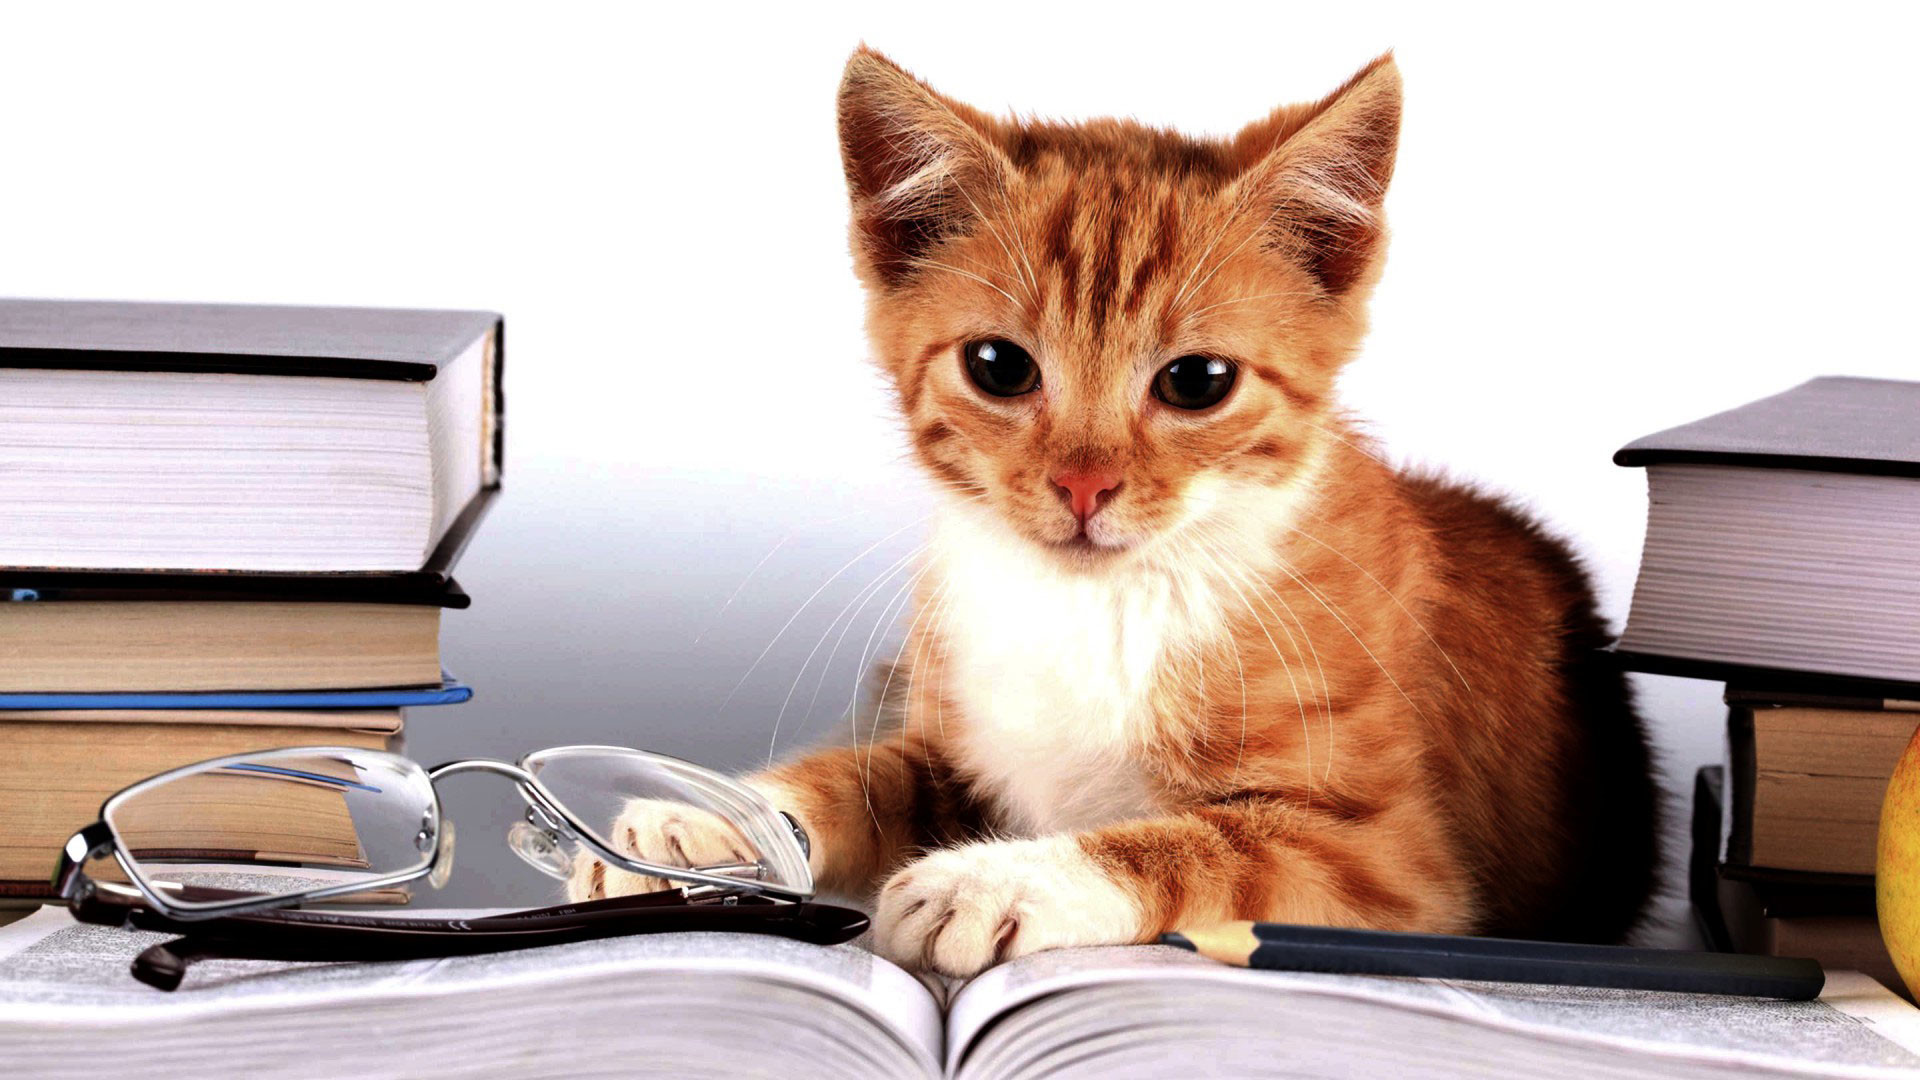 Cute Cat Studying Wallpaper Student Wallpapers 183 ① Wallpapertag